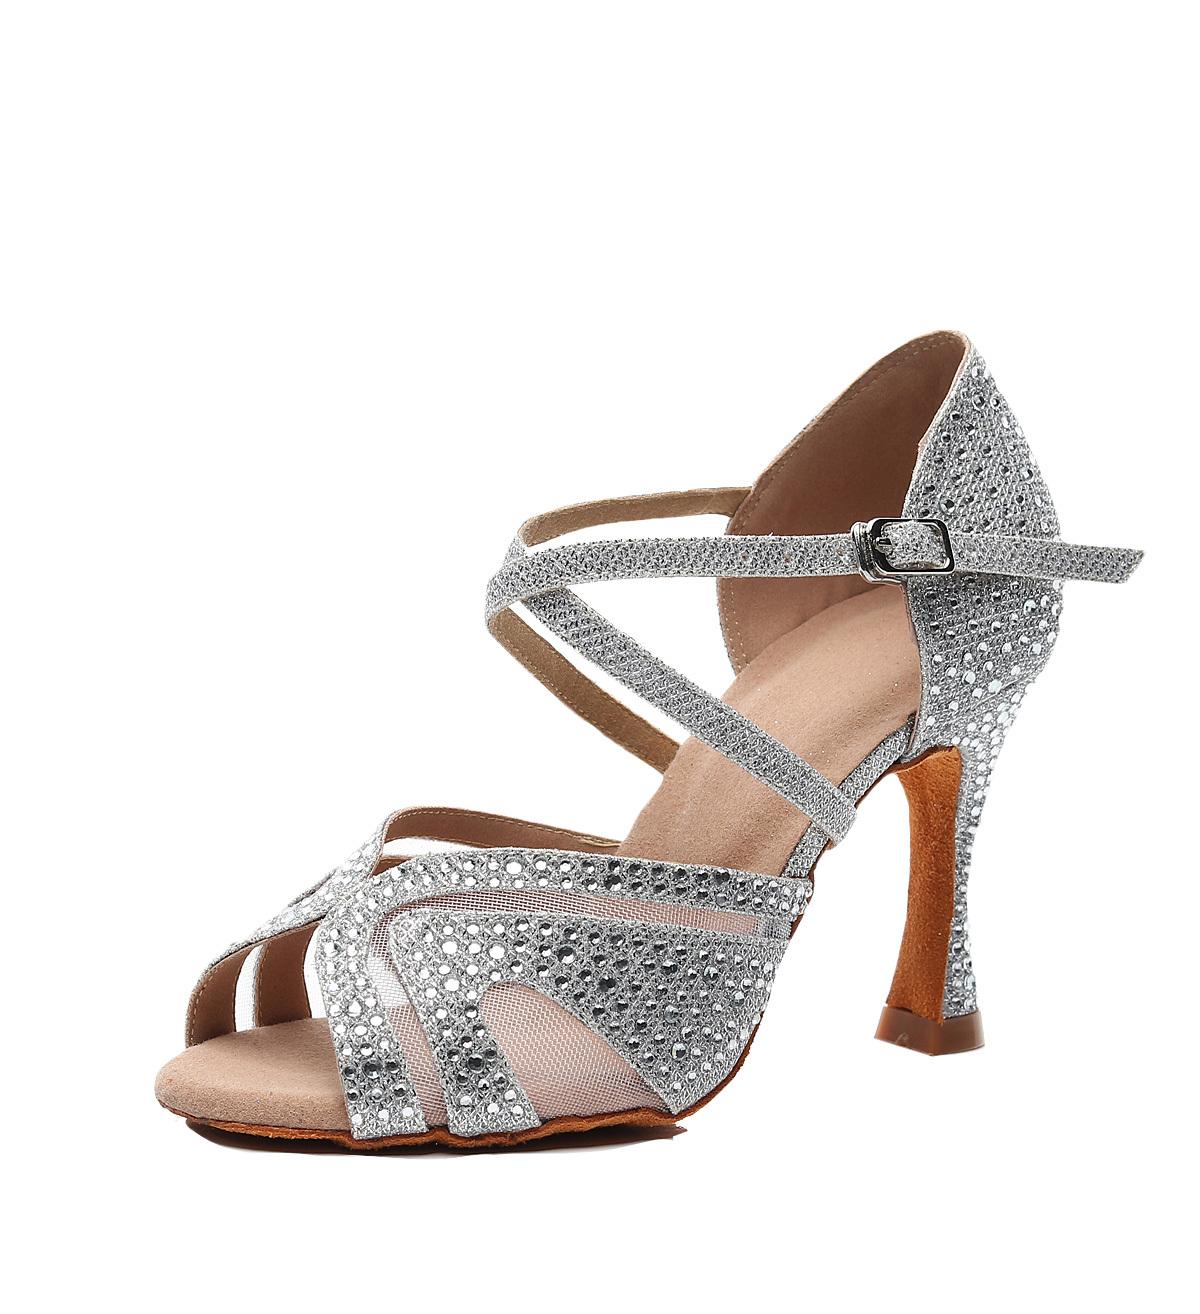 Ballroom Outdoor Salsa Tango Rubber Dance Shoe Ladies Social Women Latin Dancing Shoes Heel Rhinestone Grey